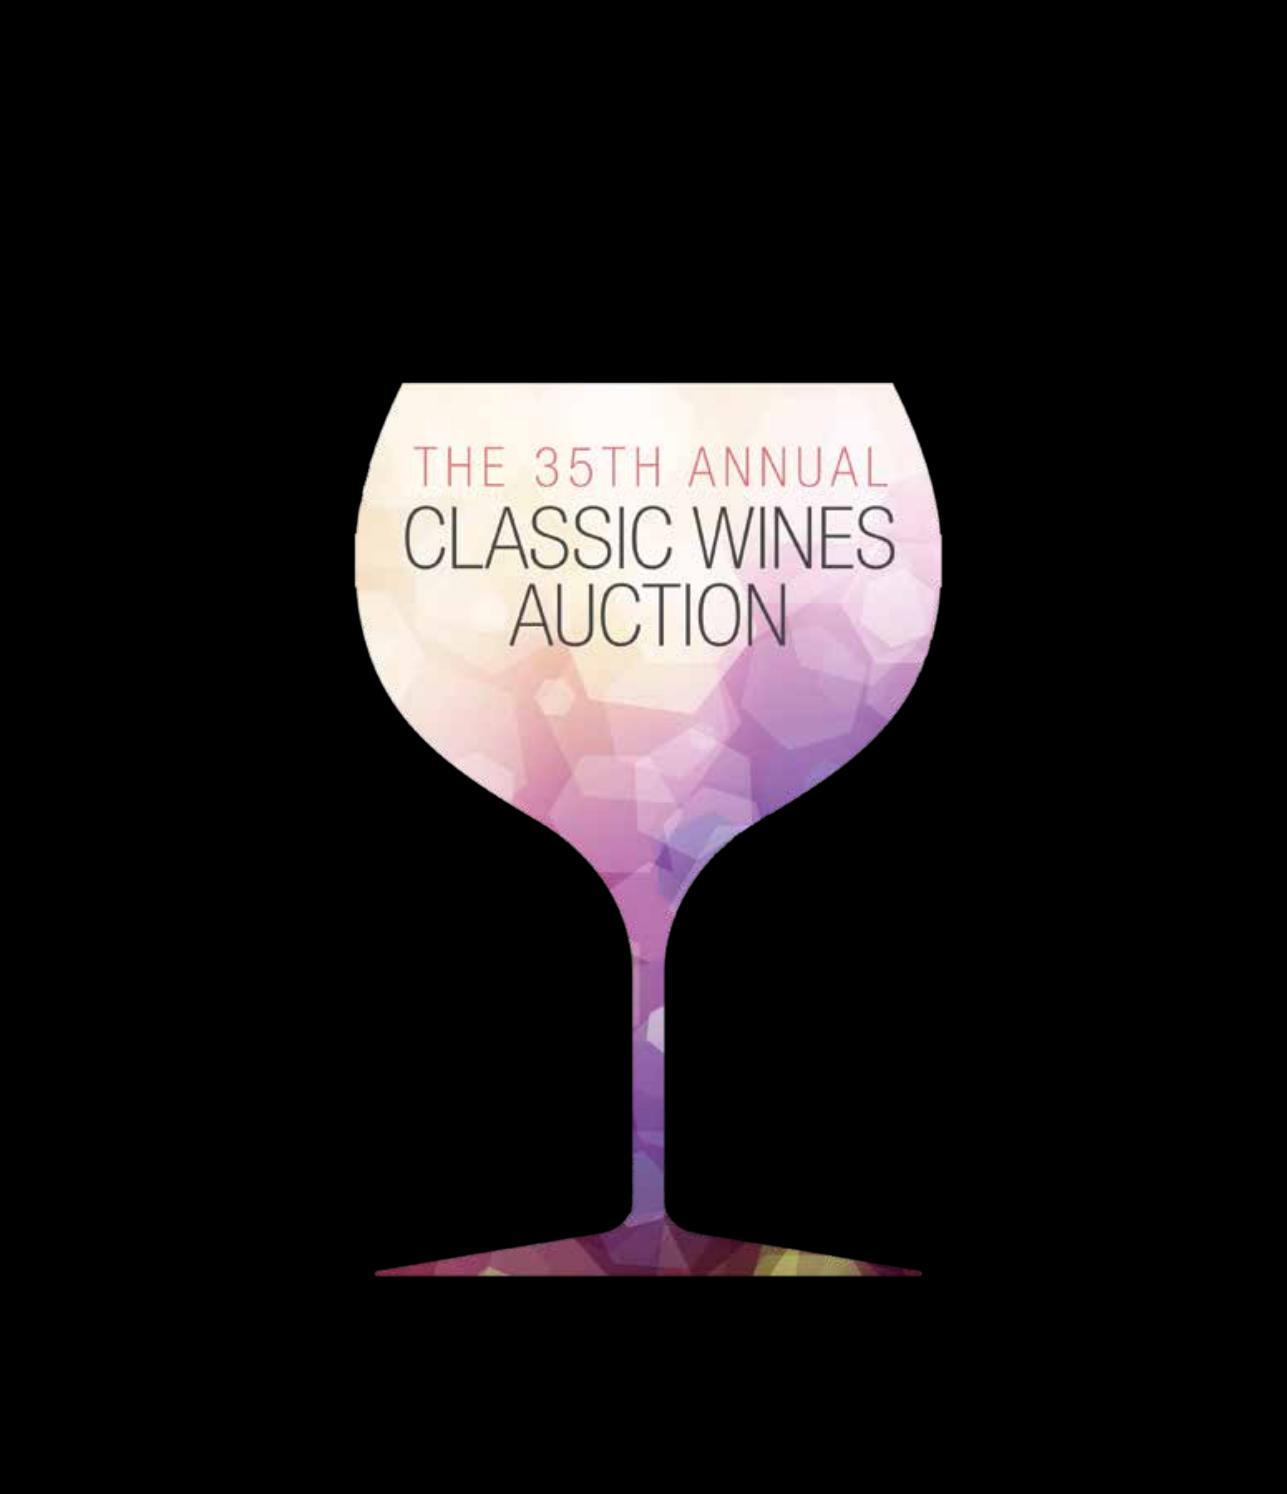 Classic Wines Auction 2019 Catalog by Artslandia - issuu